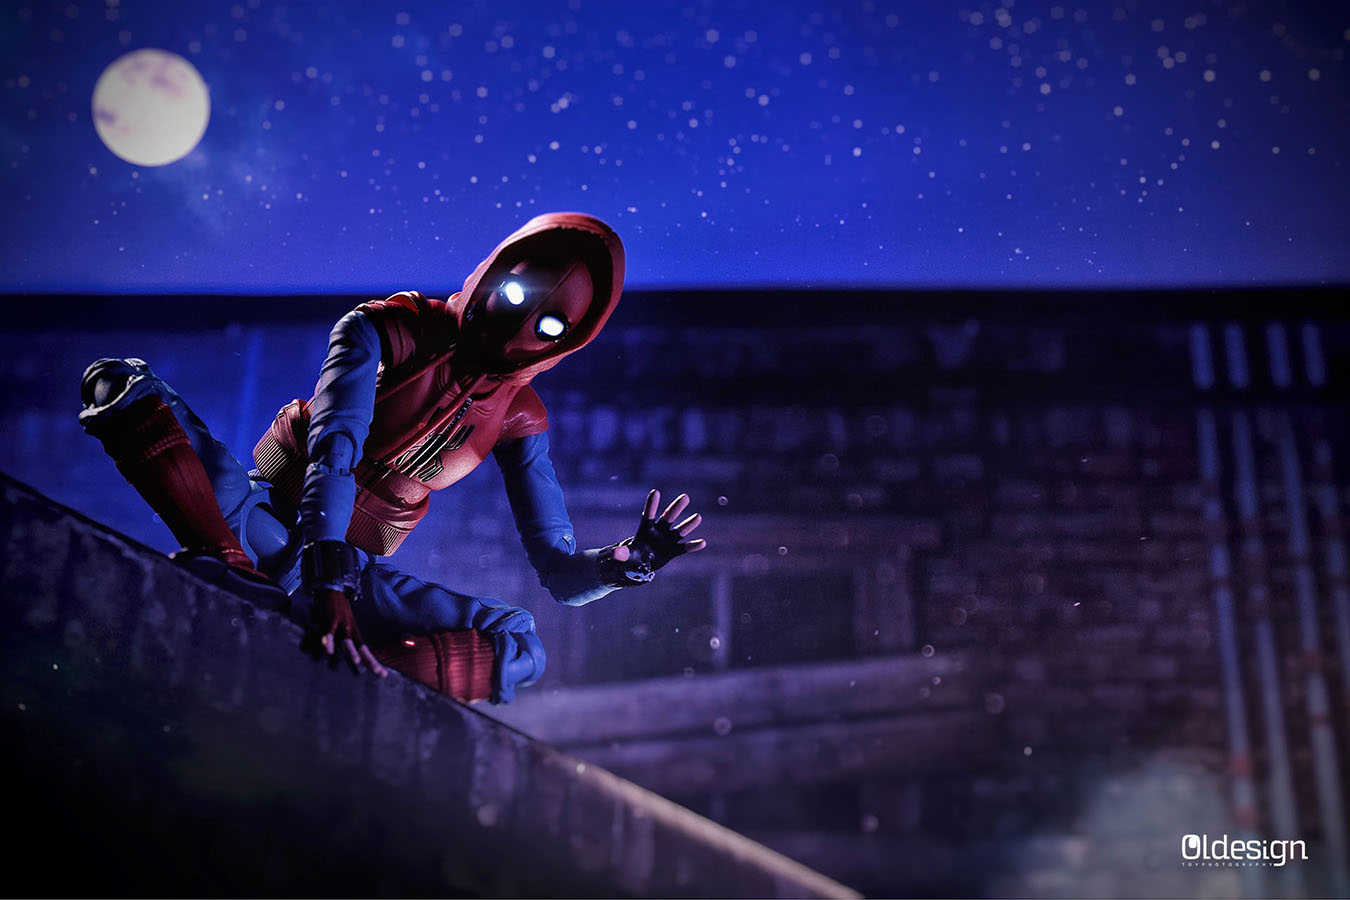 oldesign_spiderman_04